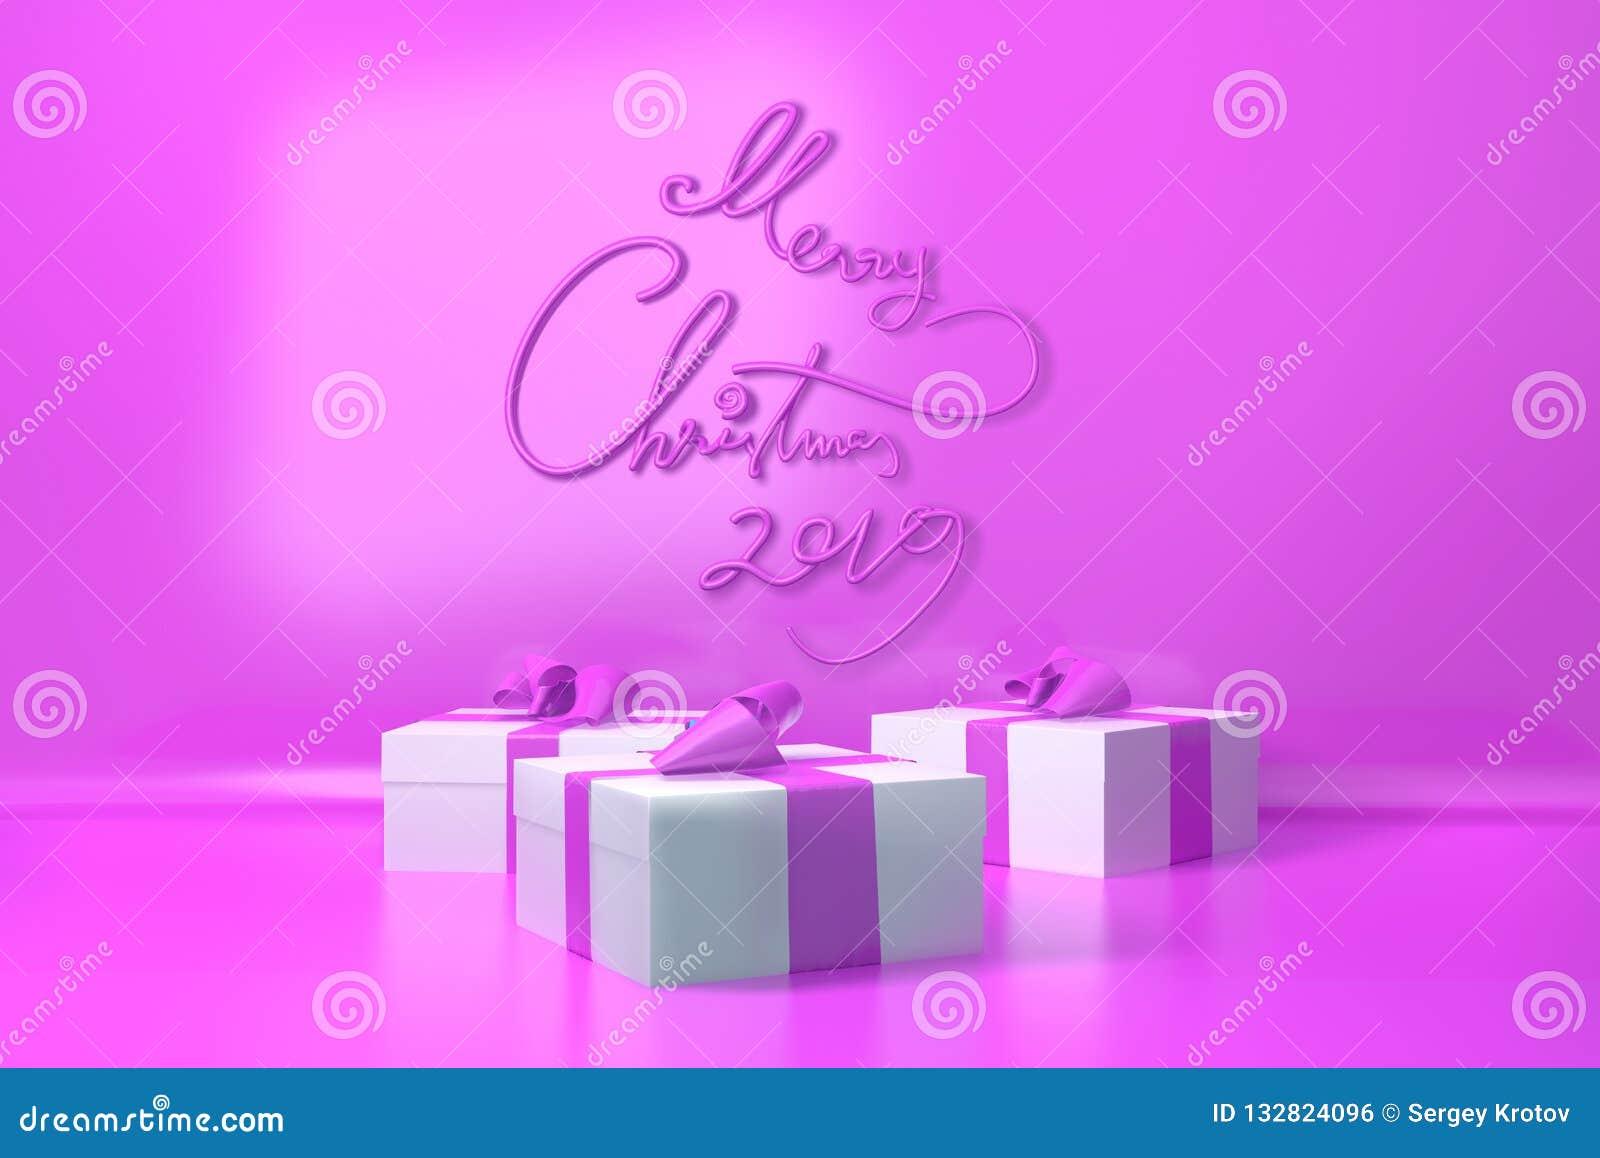 Frohe Weihnachten Brief.Frohe Weihnachten 2019 Brief Geschrieben In Modische Rosa